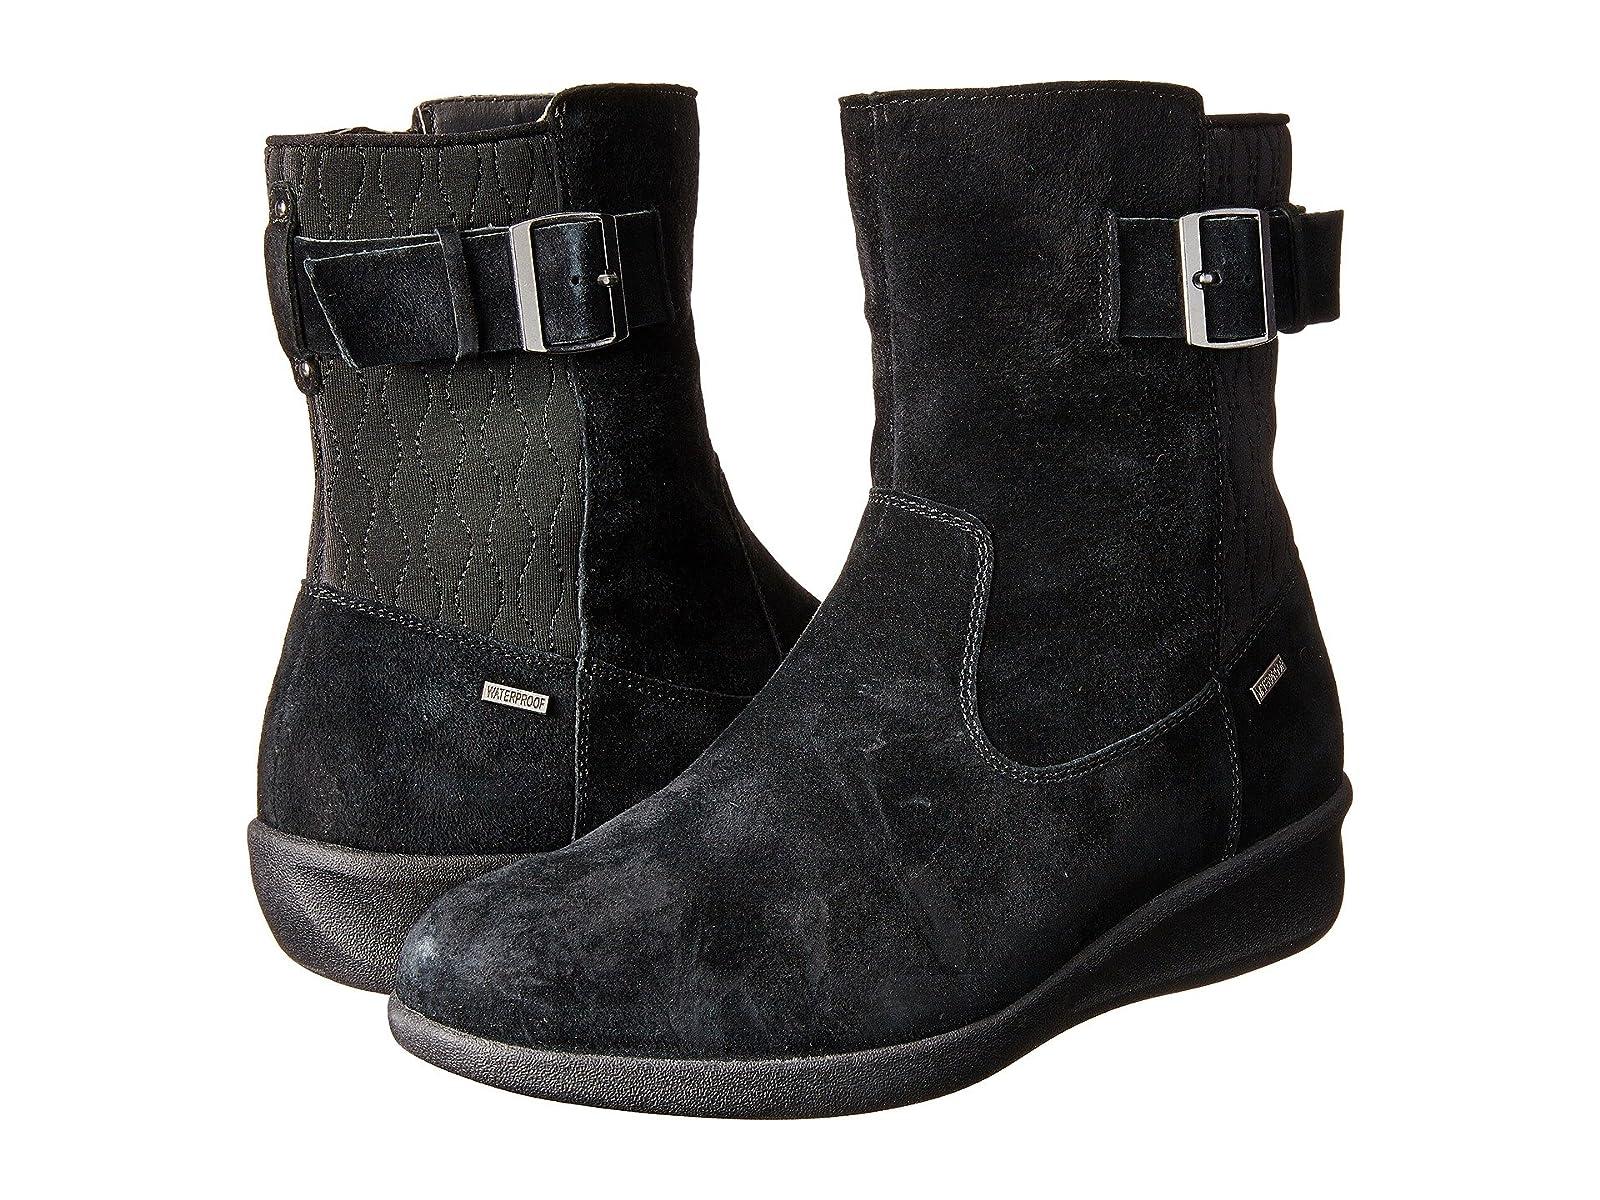 Aravon Linda-ARCheap and distinctive eye-catching shoes